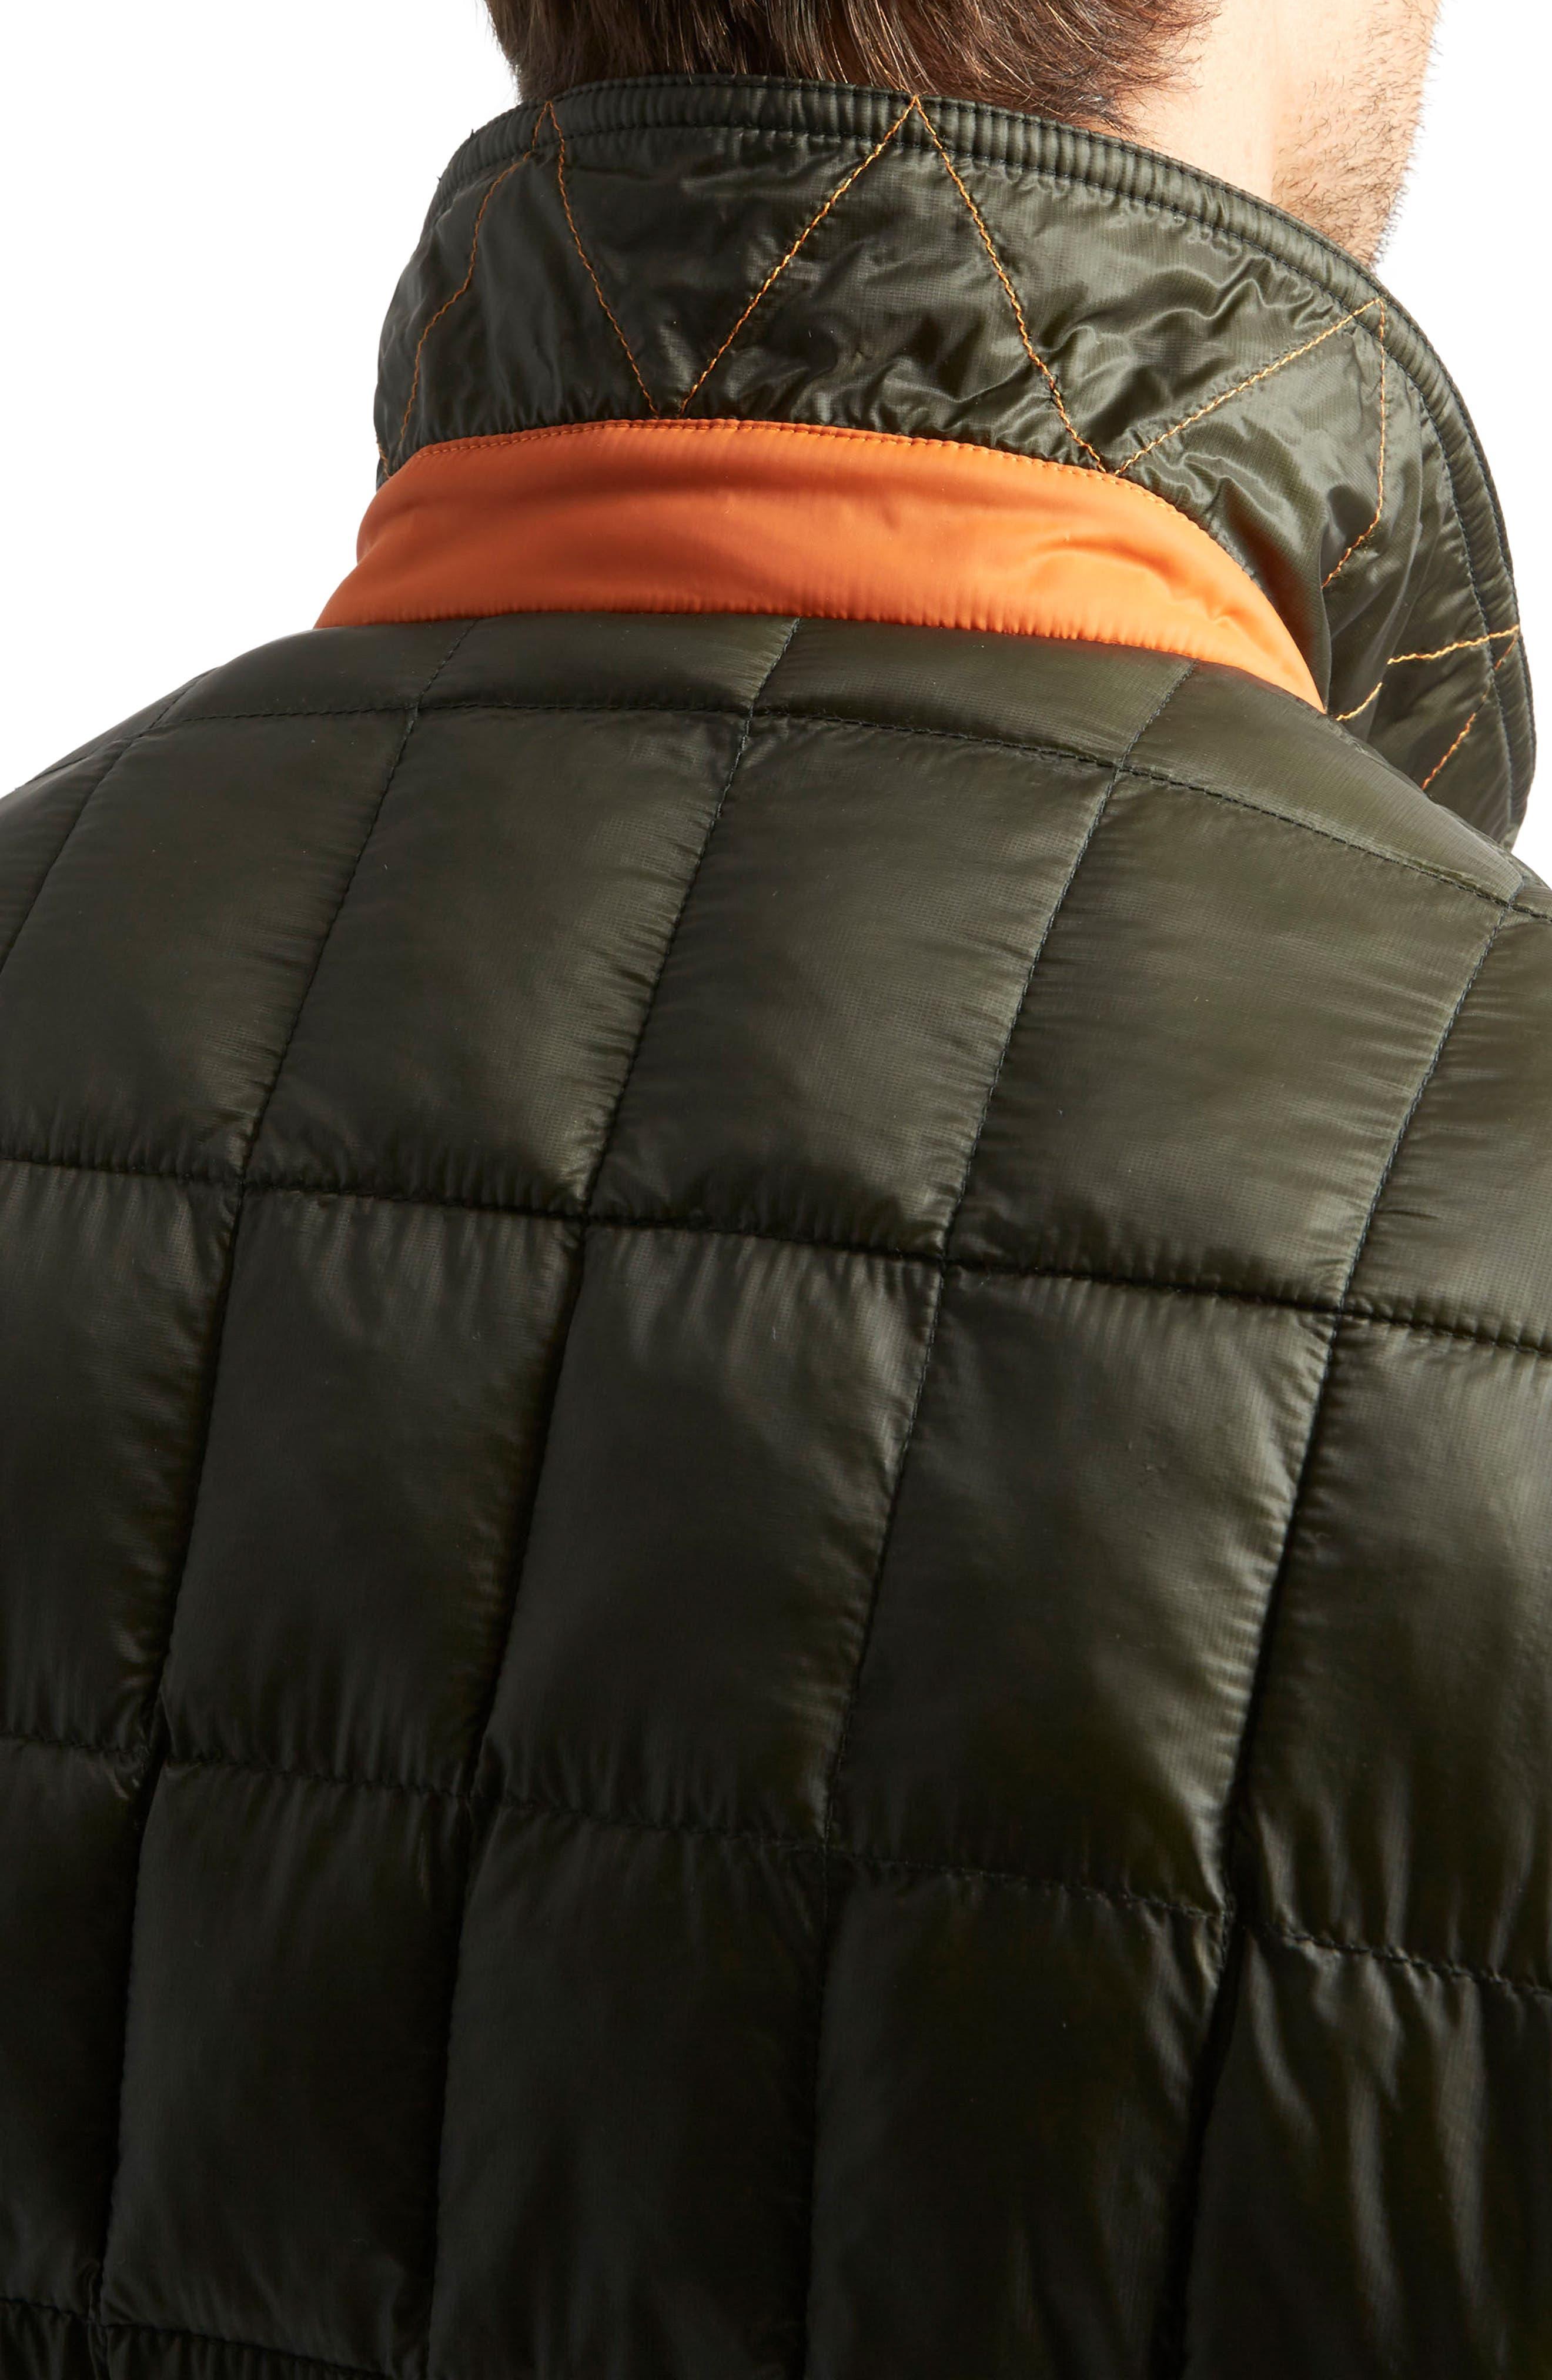 Butler Heat System Quilted Walking Jacket,                             Alternate thumbnail 3, color,                             Kale